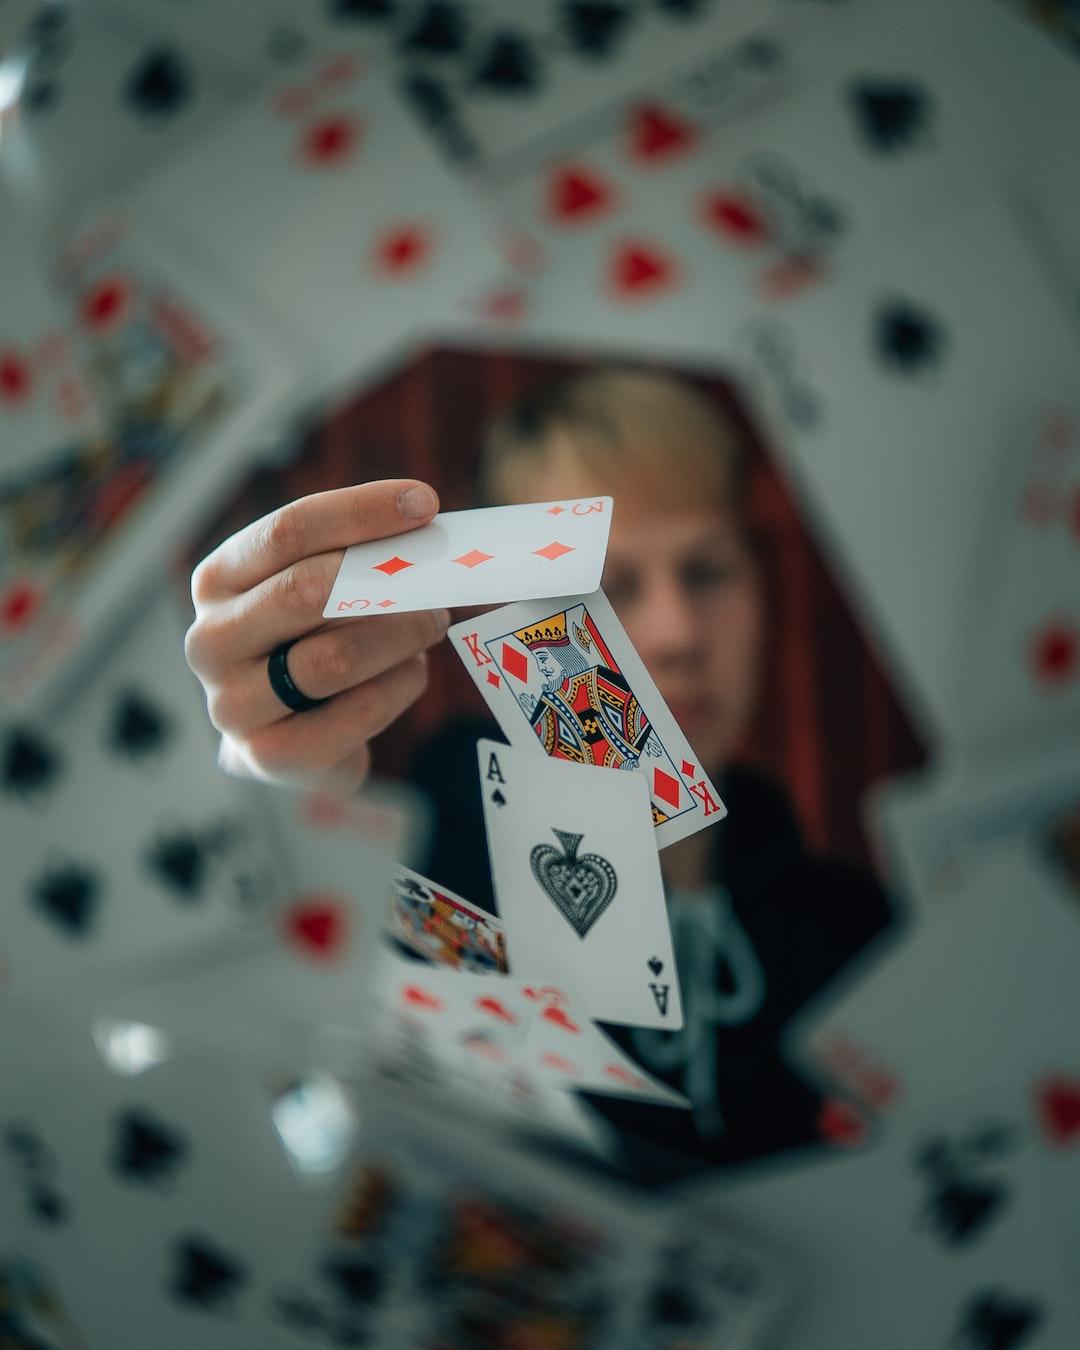 New Online Casino Gives Players a Cash Bonus